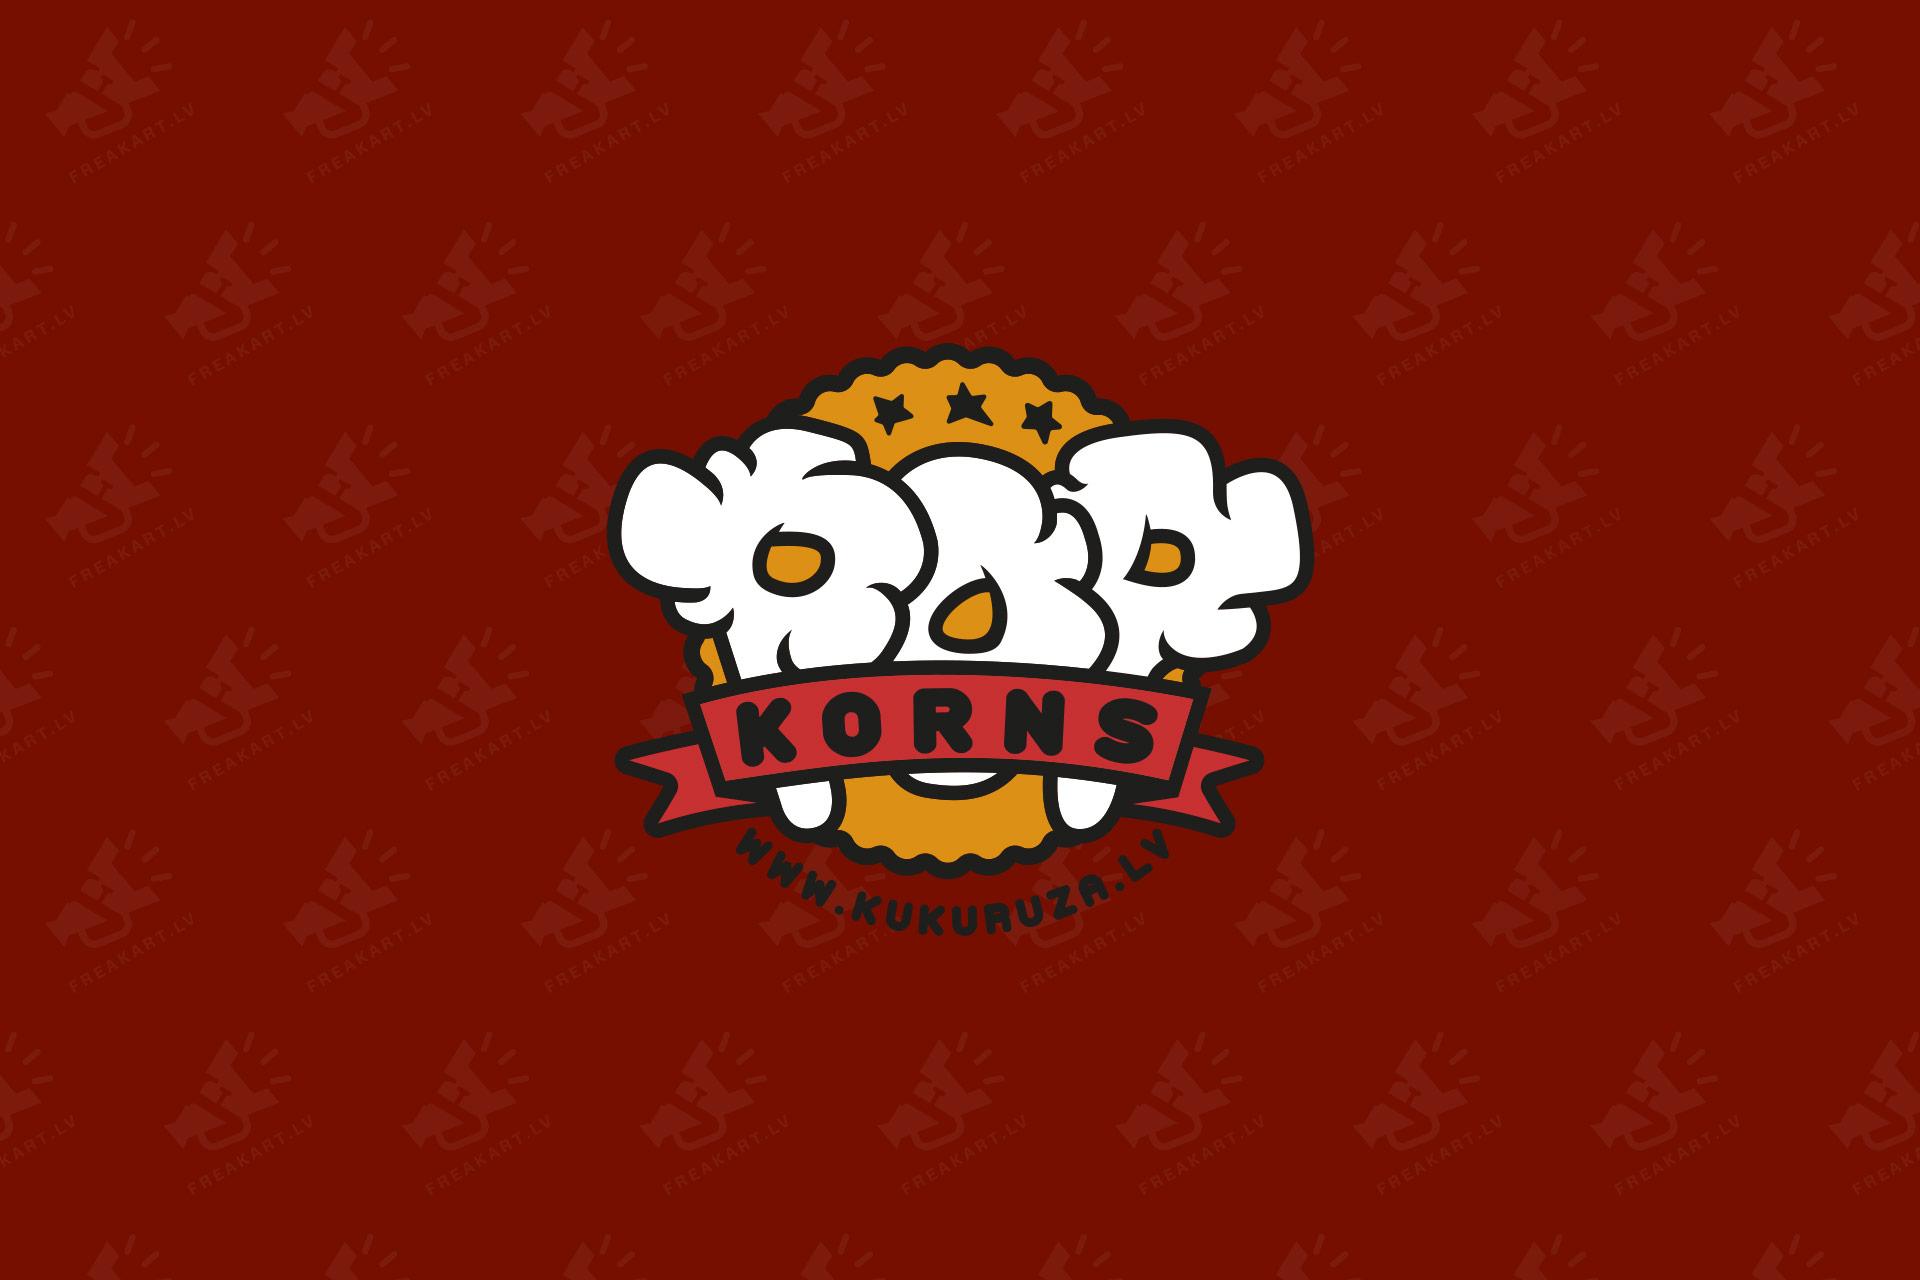 kukuruza.lv logotipa dizaina izstrāde